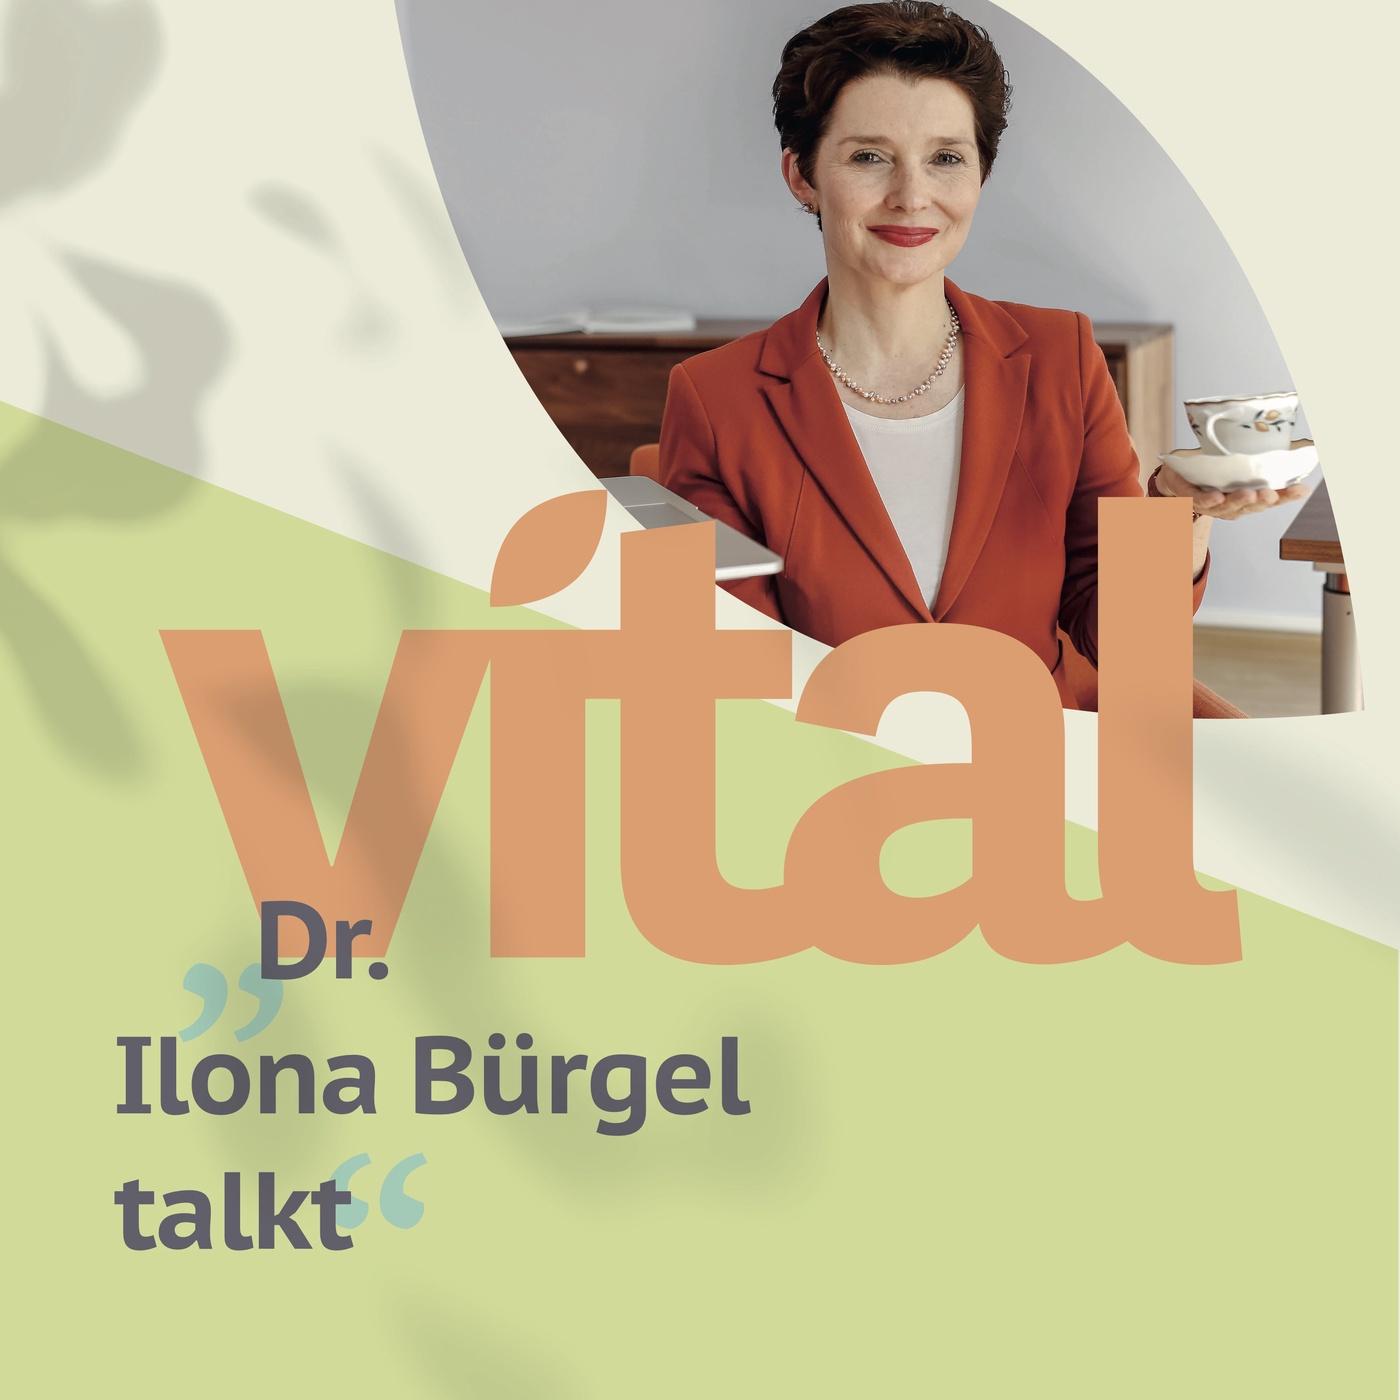 Dr. Ilona Bürgel talkt: Relax doch mal!